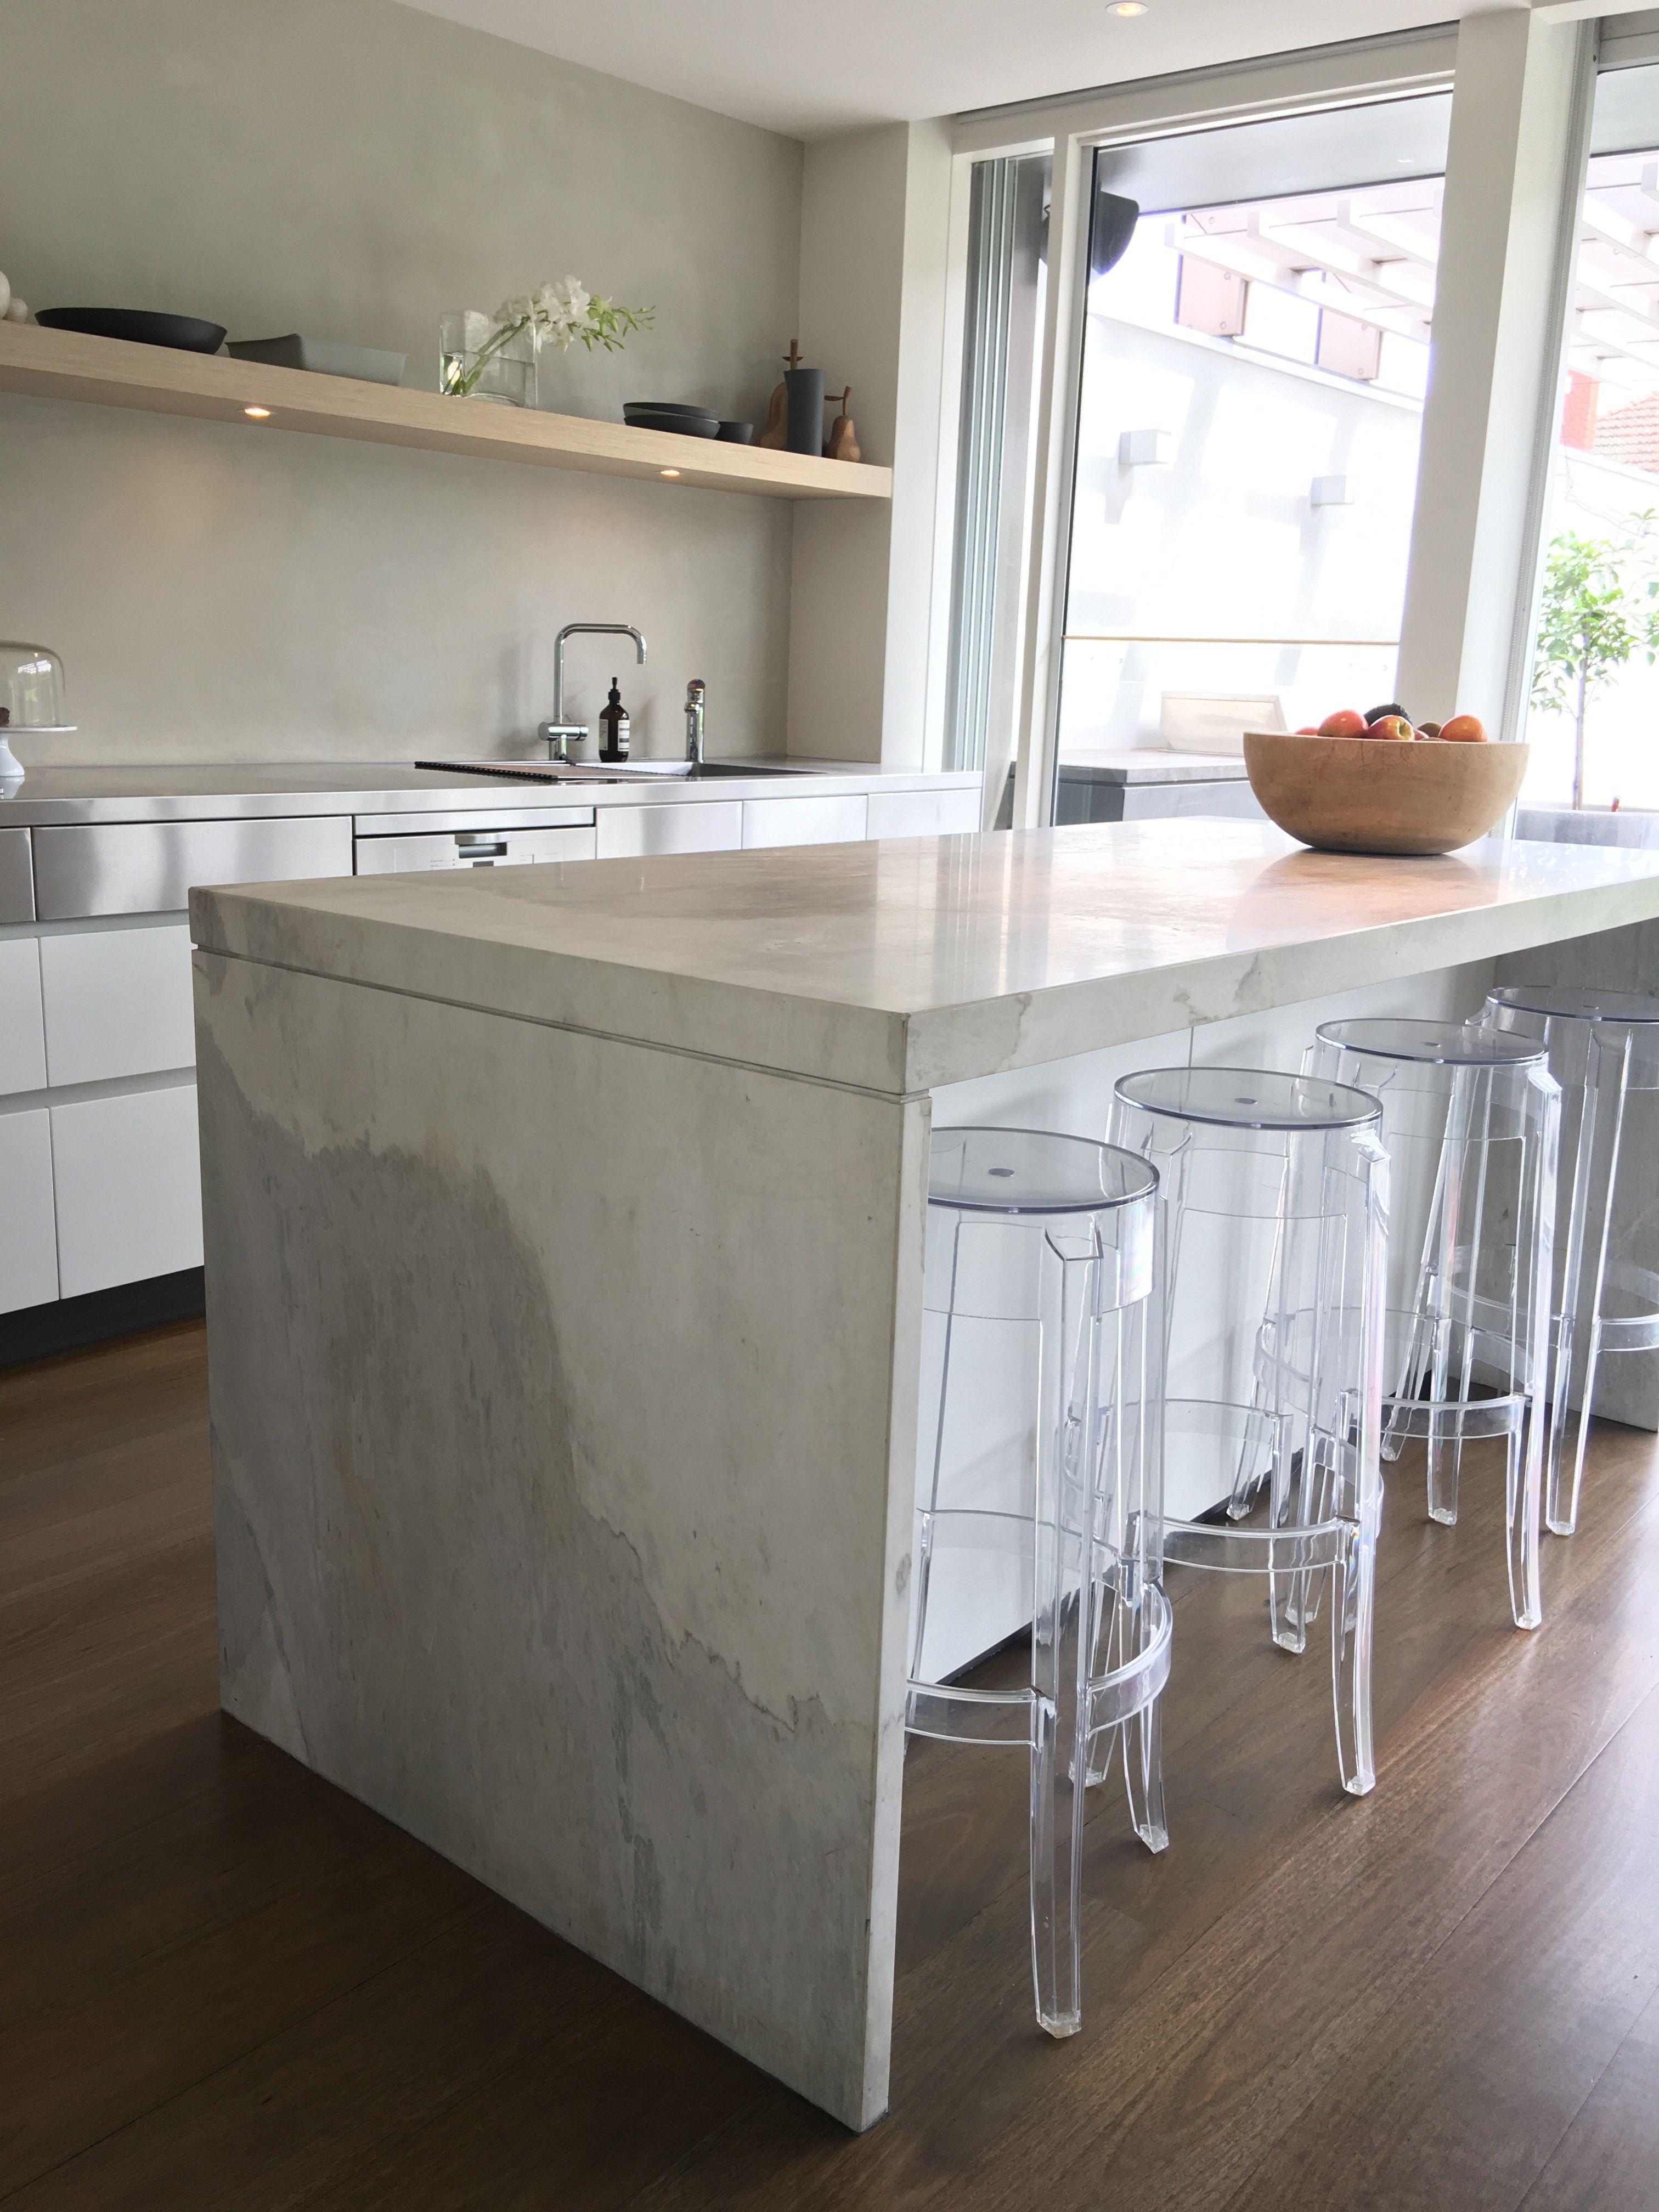 Stunning Elba Kitchen Designed By @neilarchitecture #cdkstone #elba #marble  #dolomite #